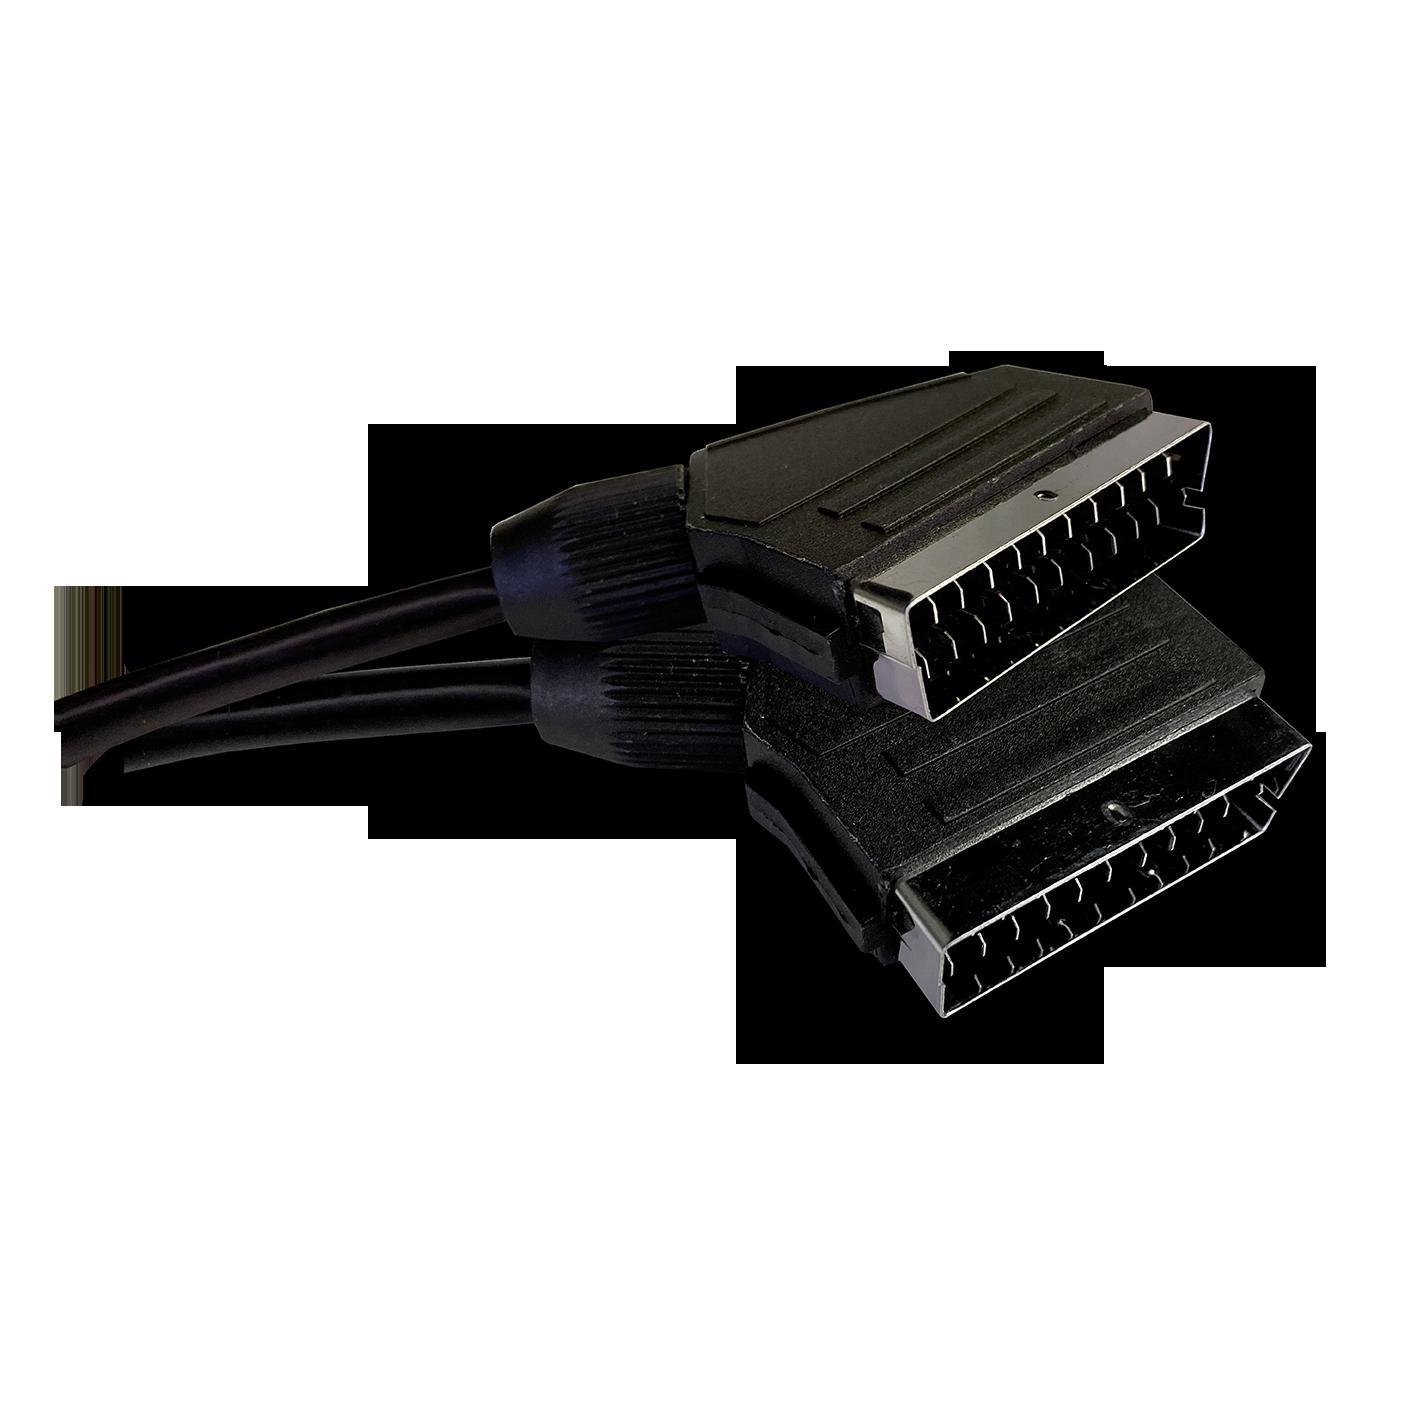 STARK kabl scart M-M (High Quality) 1.5m (Slika 3)